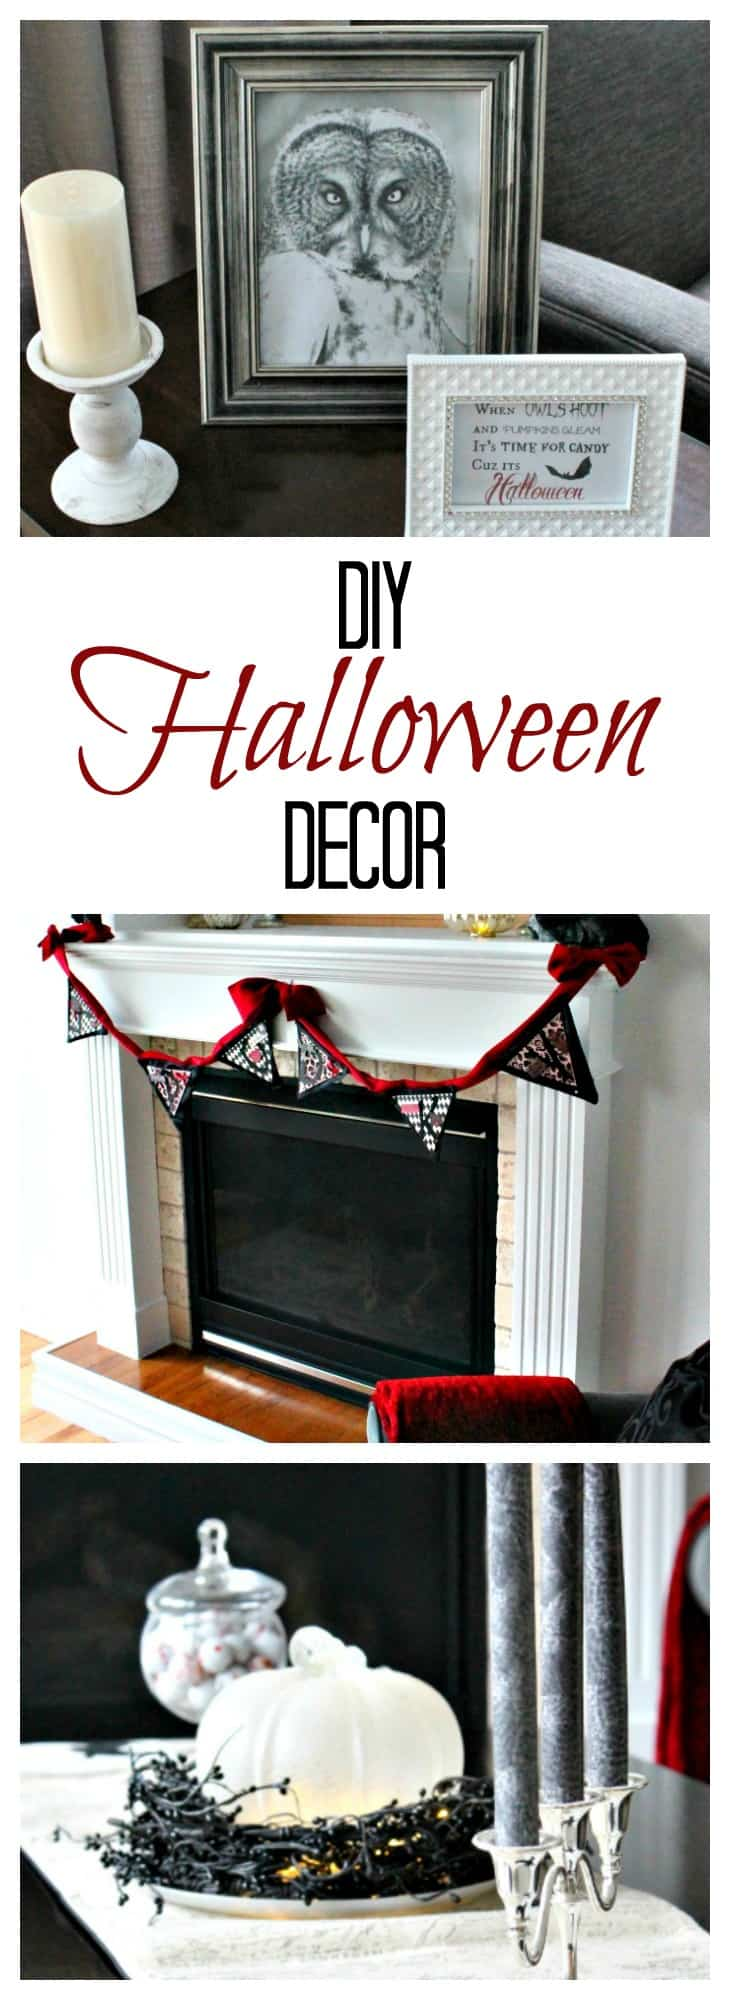 Pretty Halloween, Elegant Halloween, DIY Halloween Decorations, Halloween Decor, DIY Halloween Decor